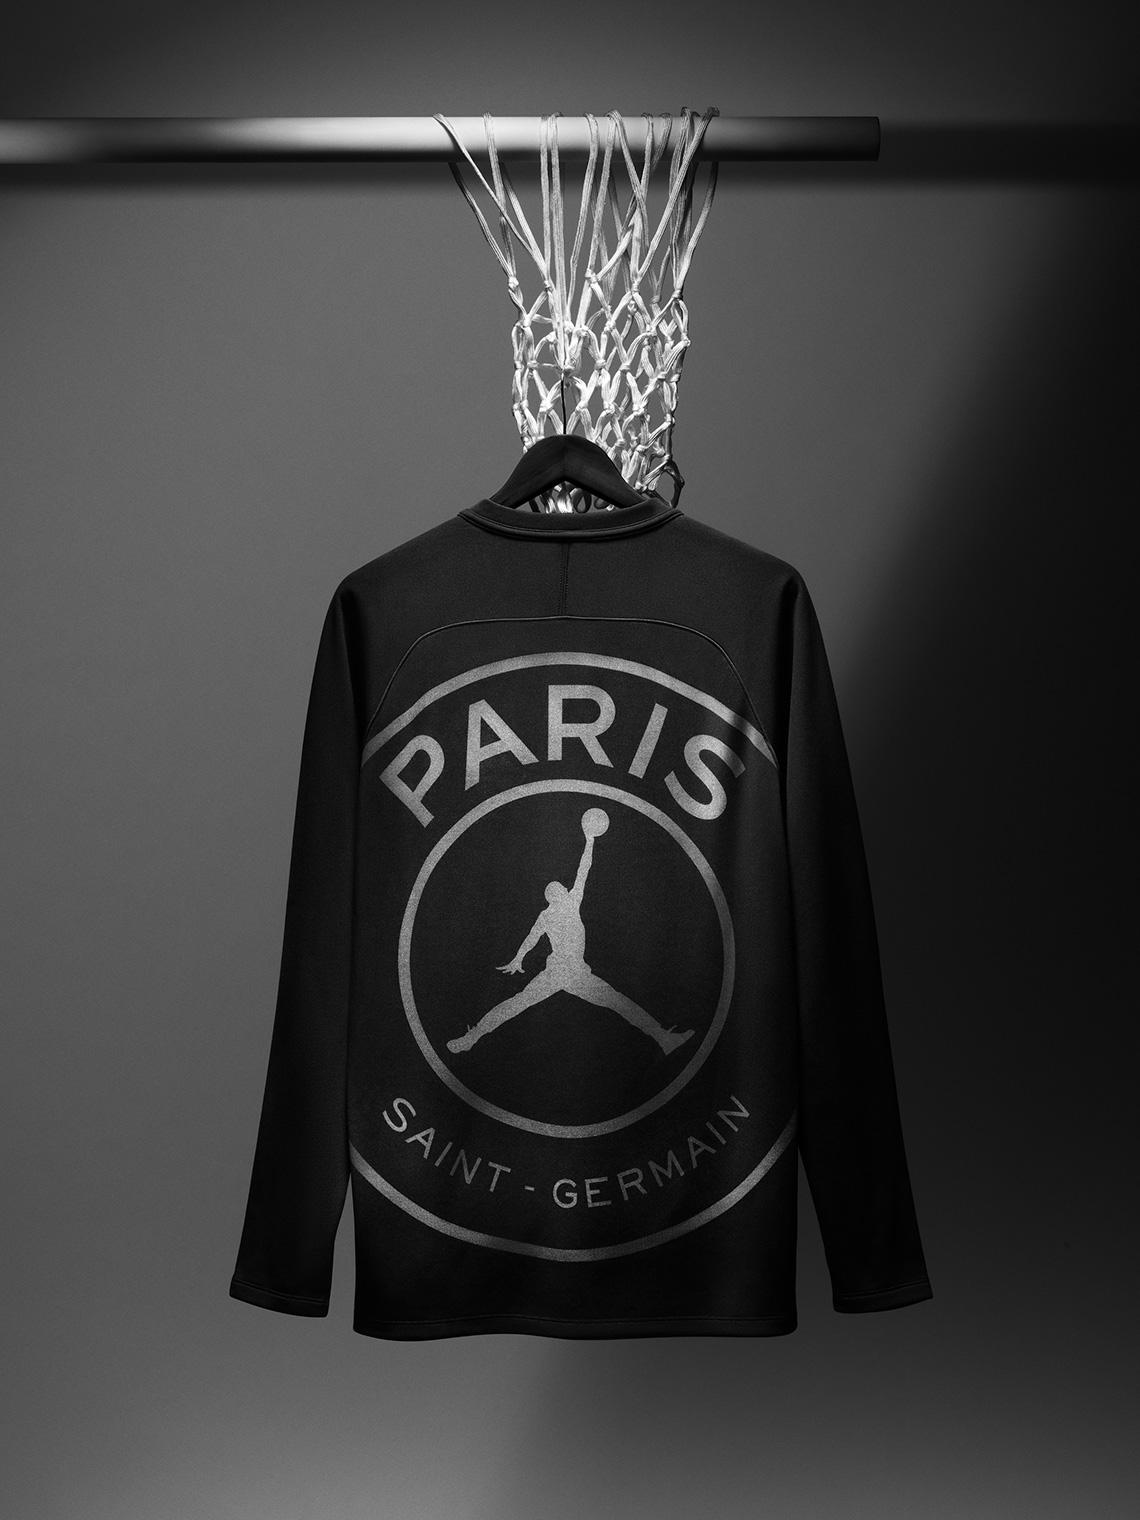 b27f5575220b Jordan 5 PSG Paris Saint-Germain - Where To Buy